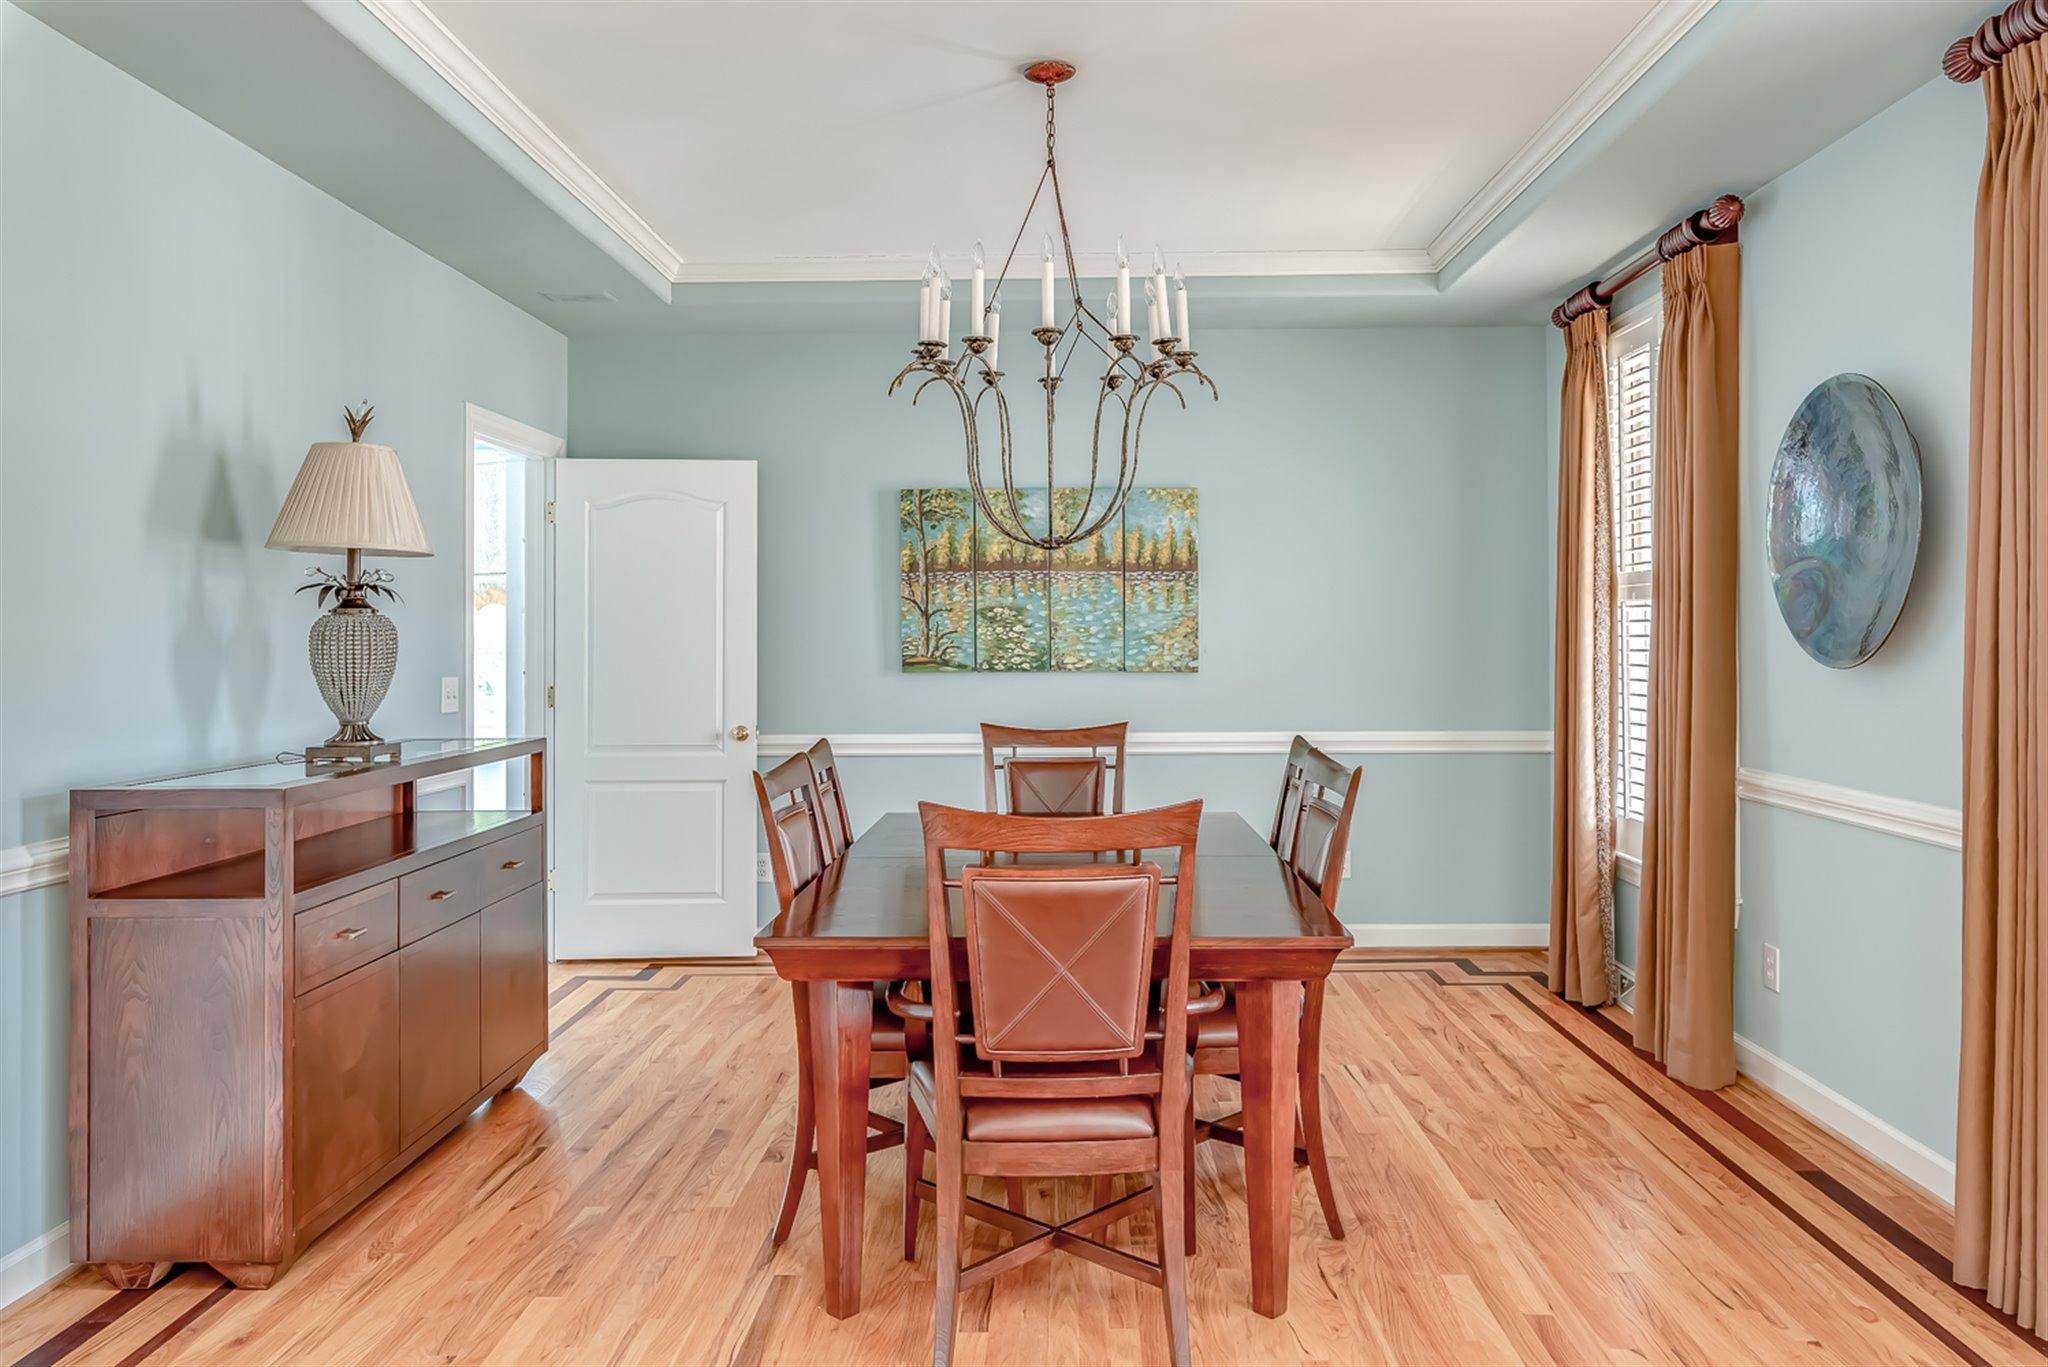 Indigo Point Homes For Sale - 50 Indigo Point, Charleston, SC - 17